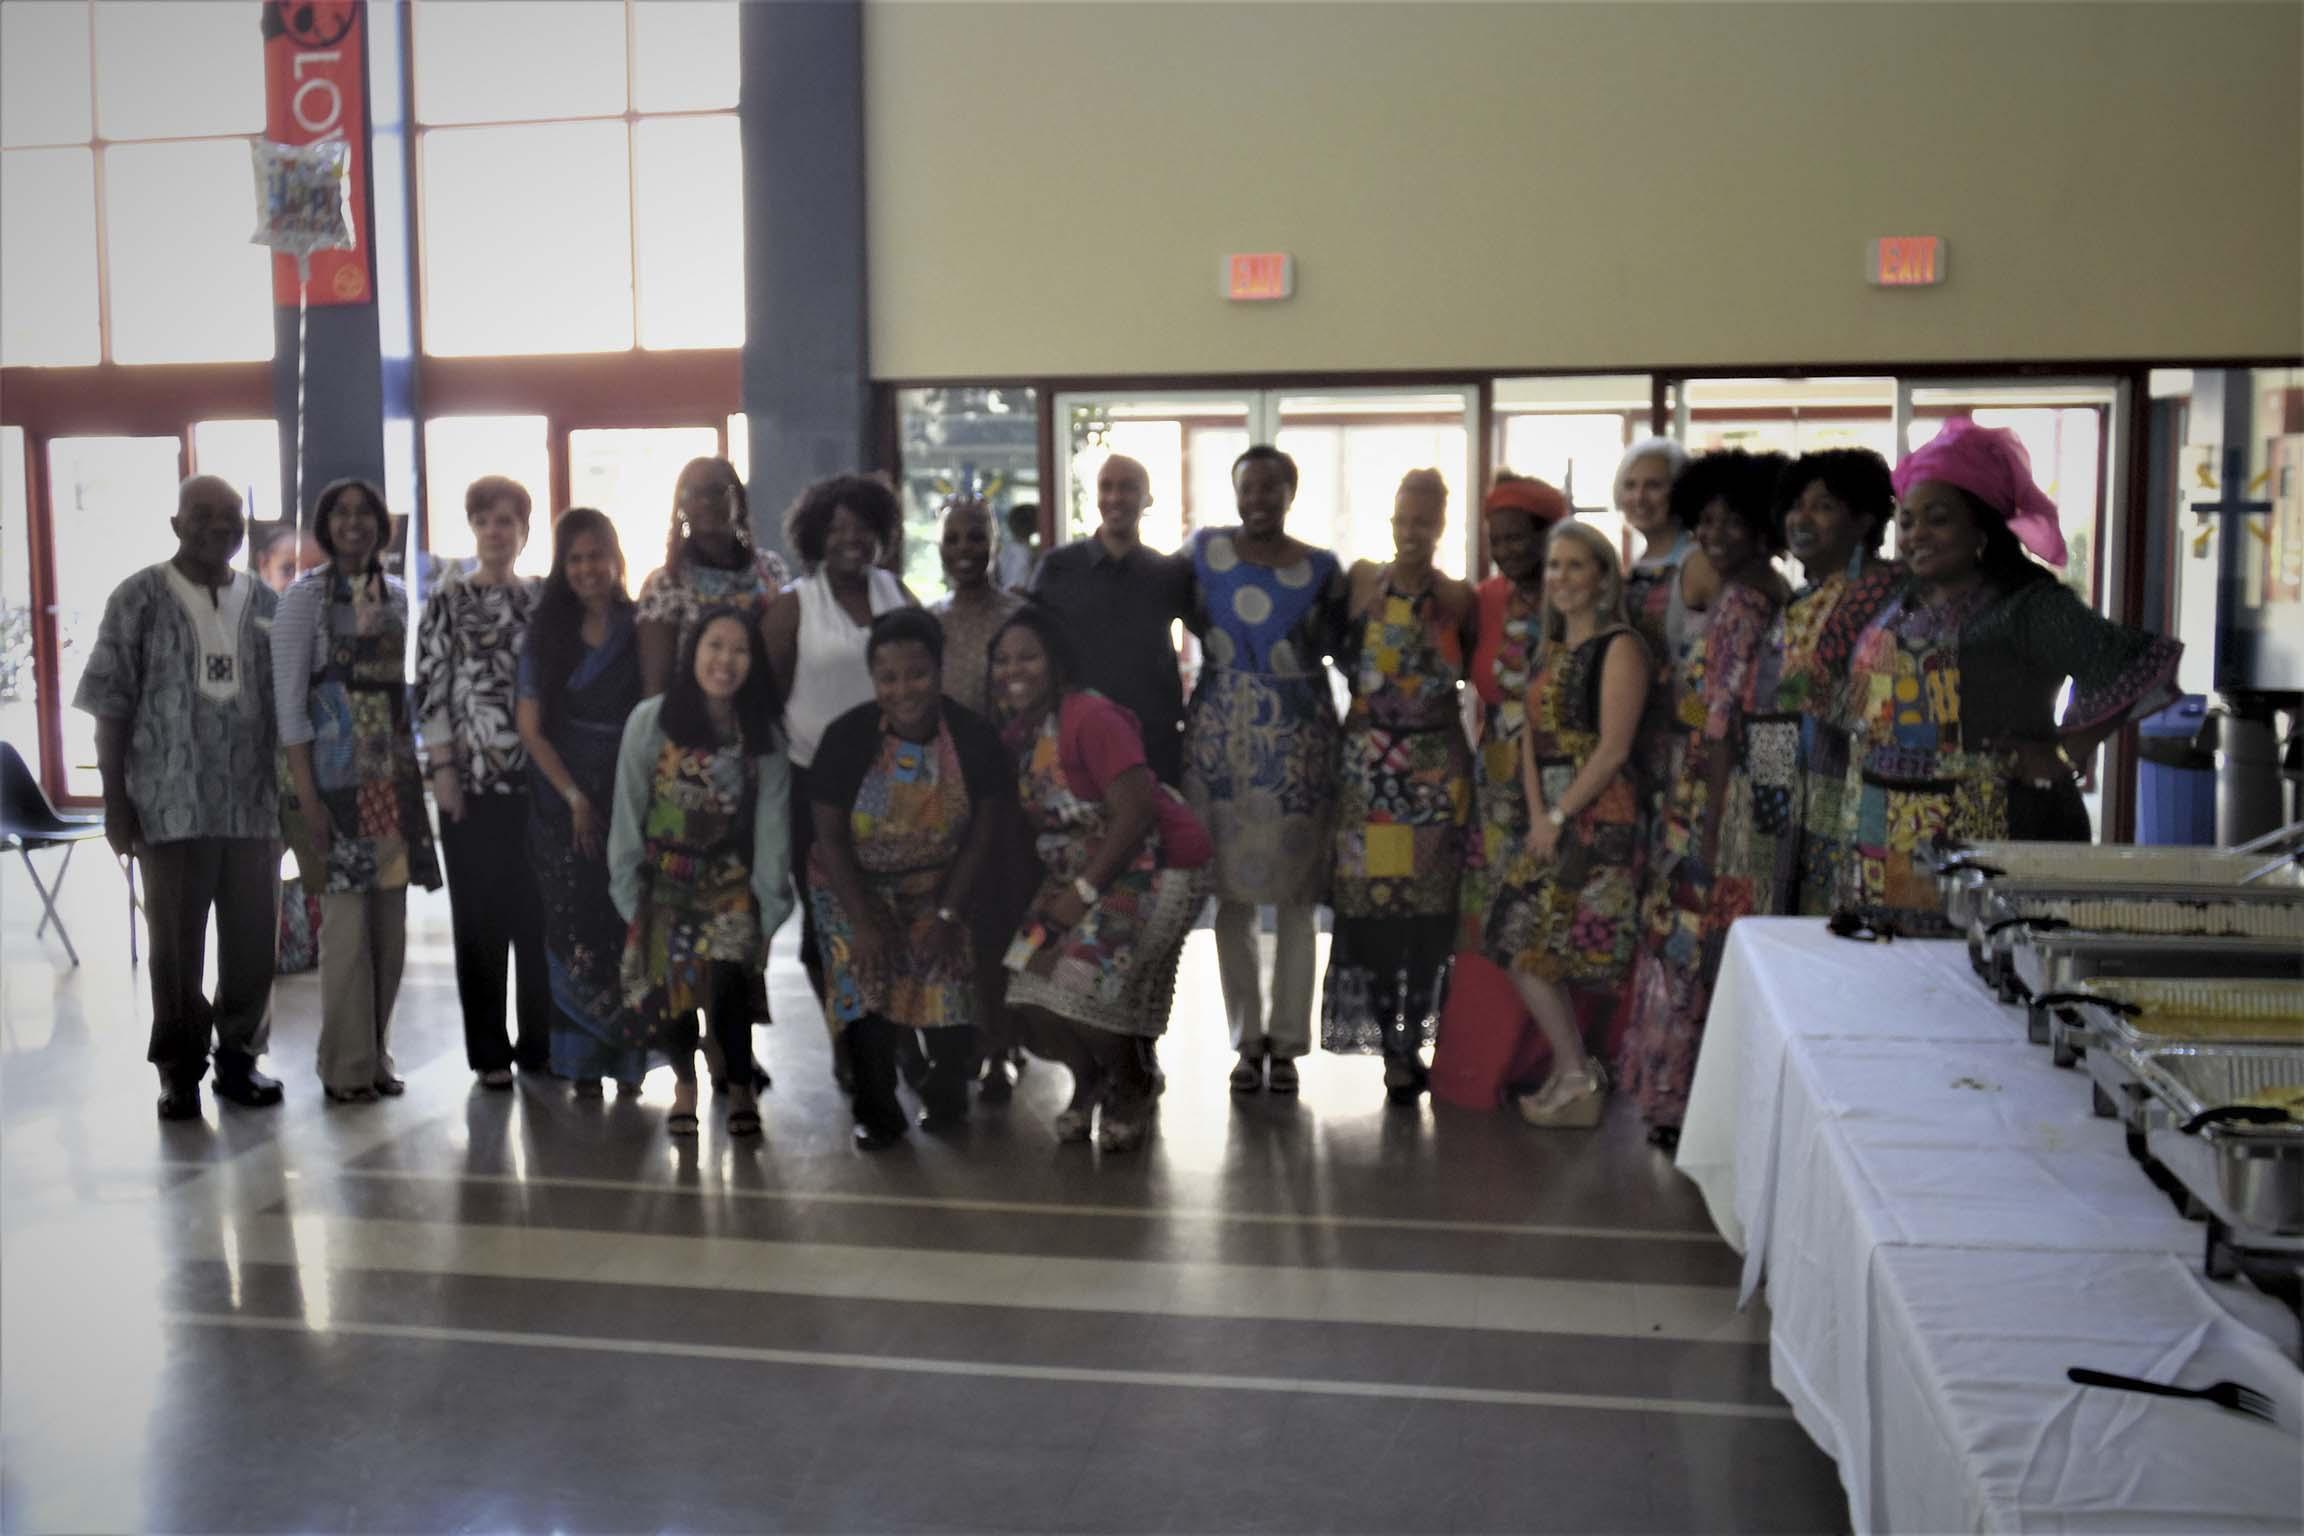 web Barankitse 2019Asike_African_Sisters_Information_Knowledge_Education_Fundraiser_2017_Goals_200Girls_2020.GROUP_Photo_Aprons_Circleweb